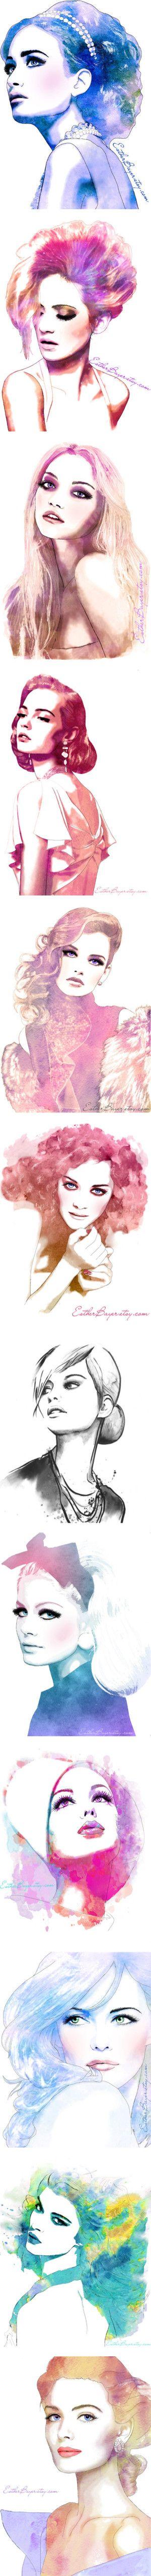 """Watercolor Fashion Drawings"" by meschtera"